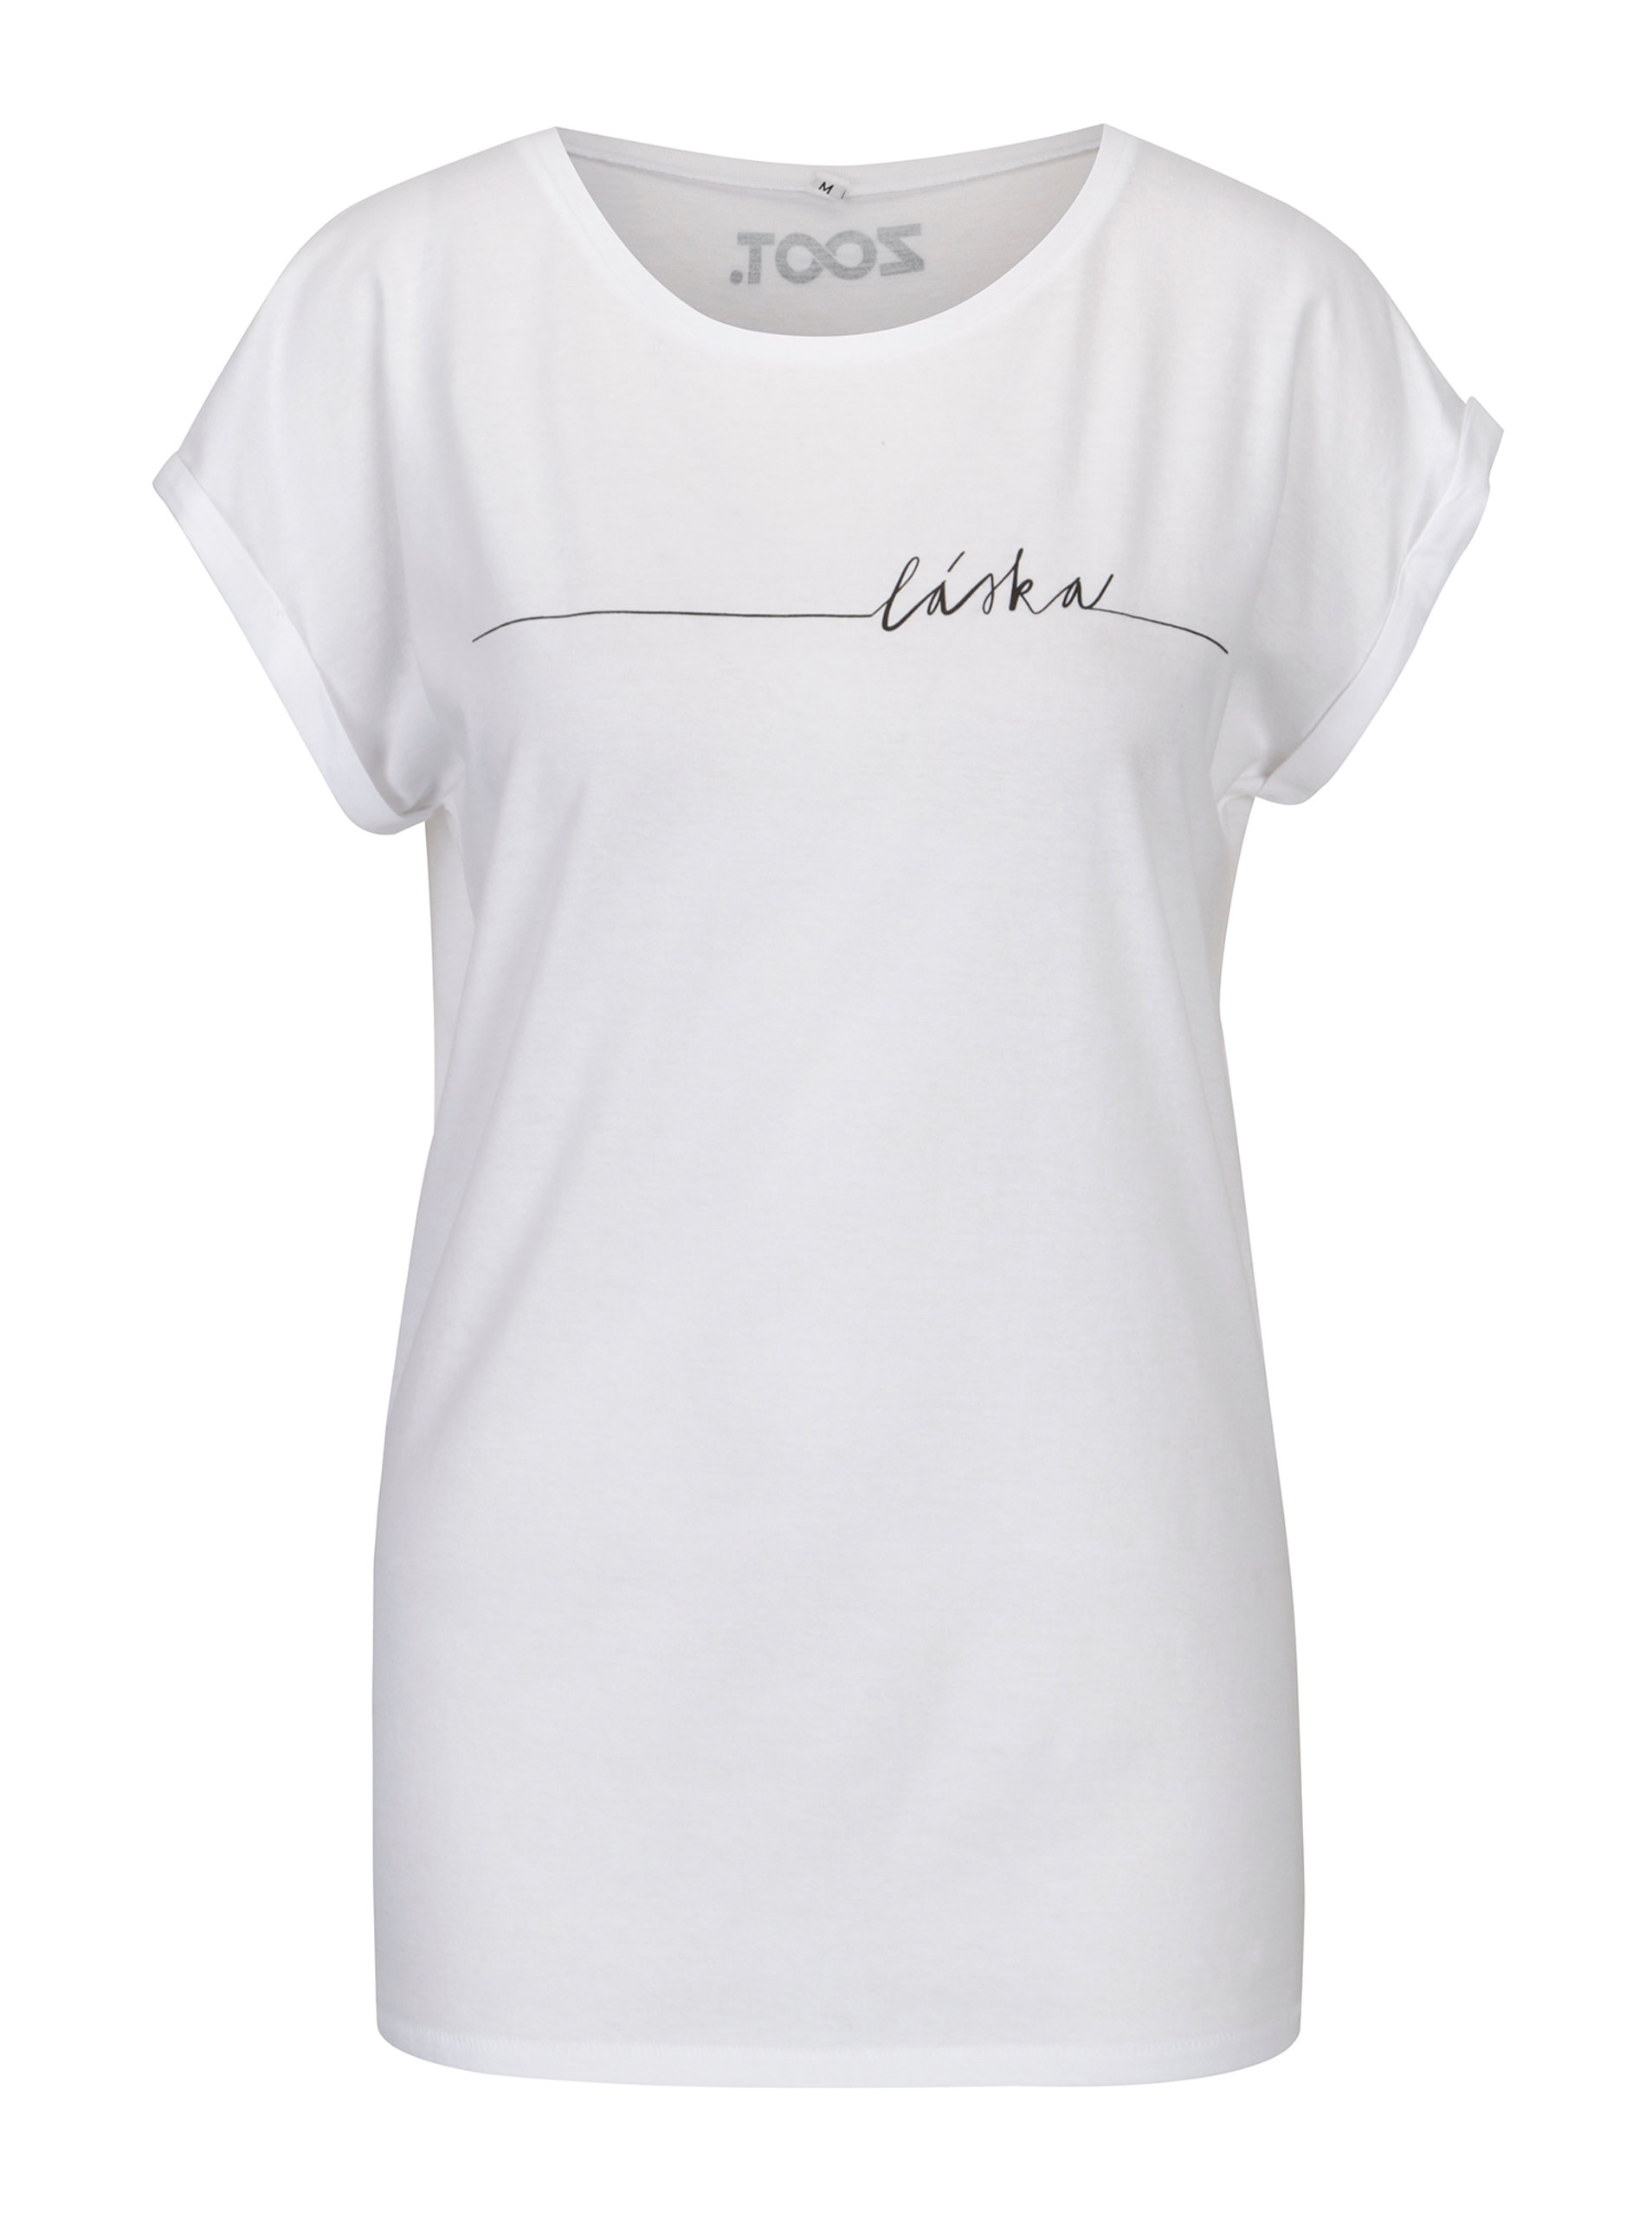 Bílé dámské tričko s potiskem ZOOT Original Láska ... e98aed6ff2